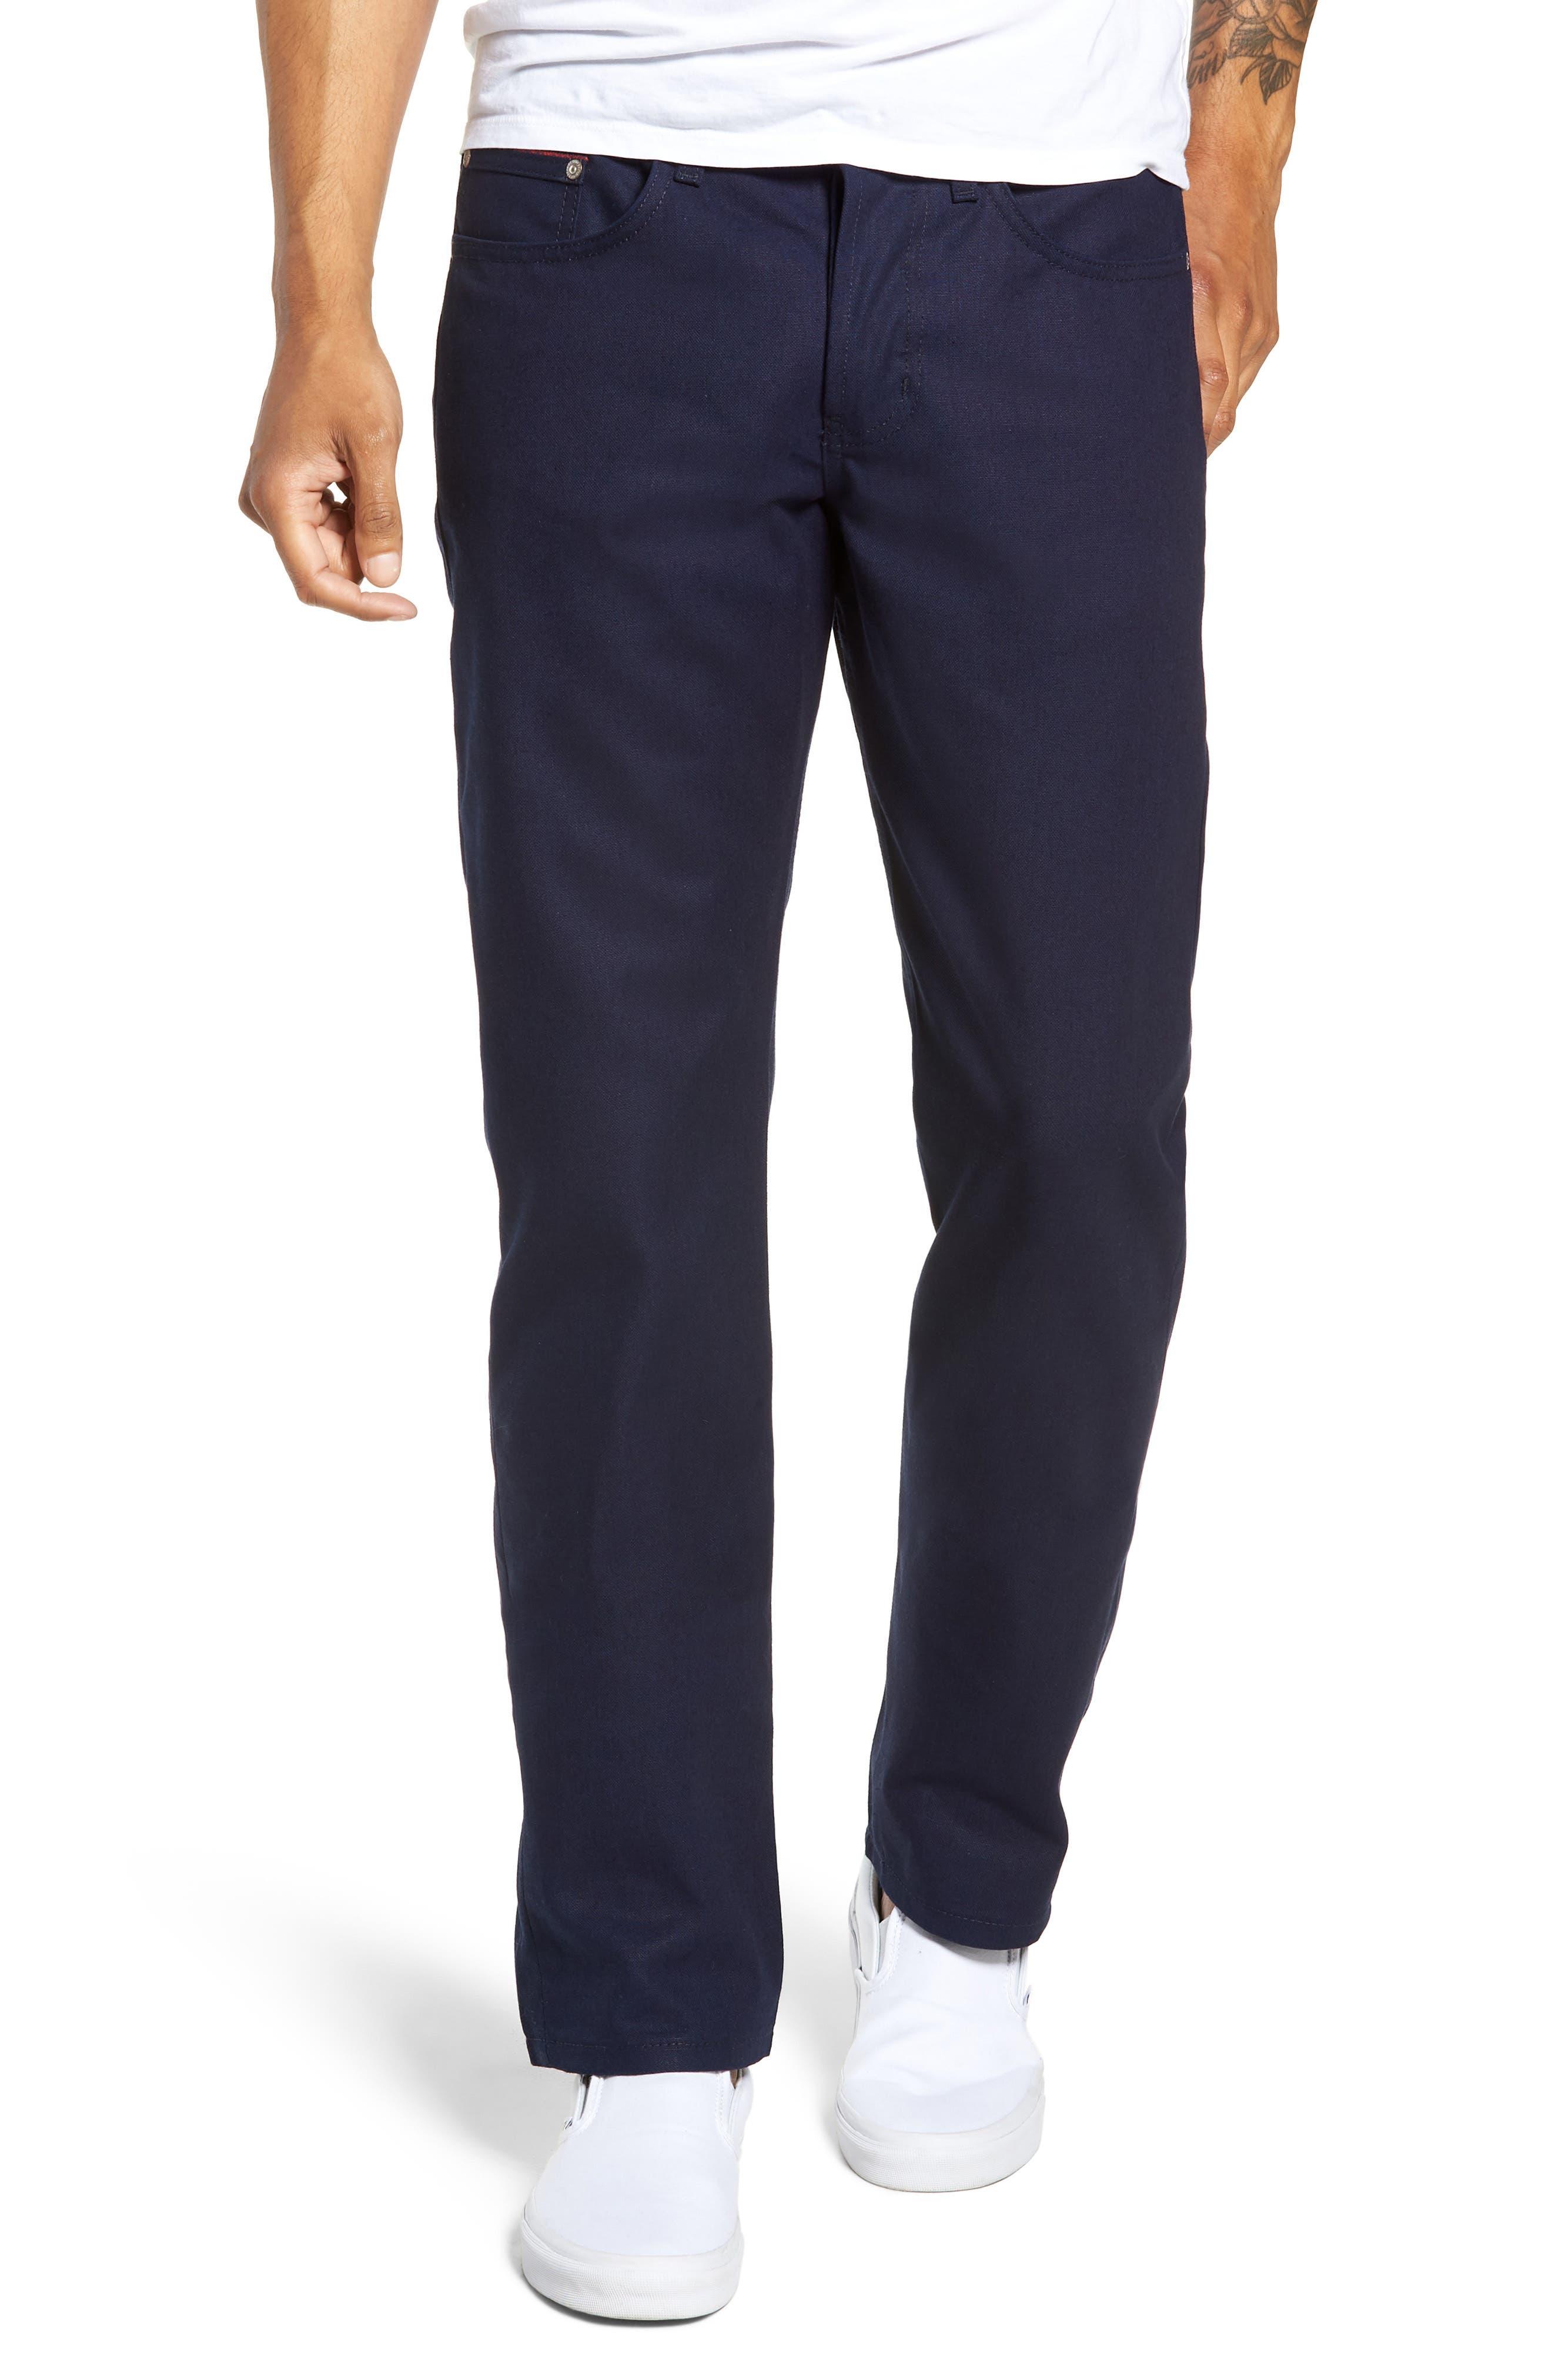 Weird Guy Slim Fit Jeans,                             Main thumbnail 1, color,                             INDIGO DUCK CANVAS SELVEDGE